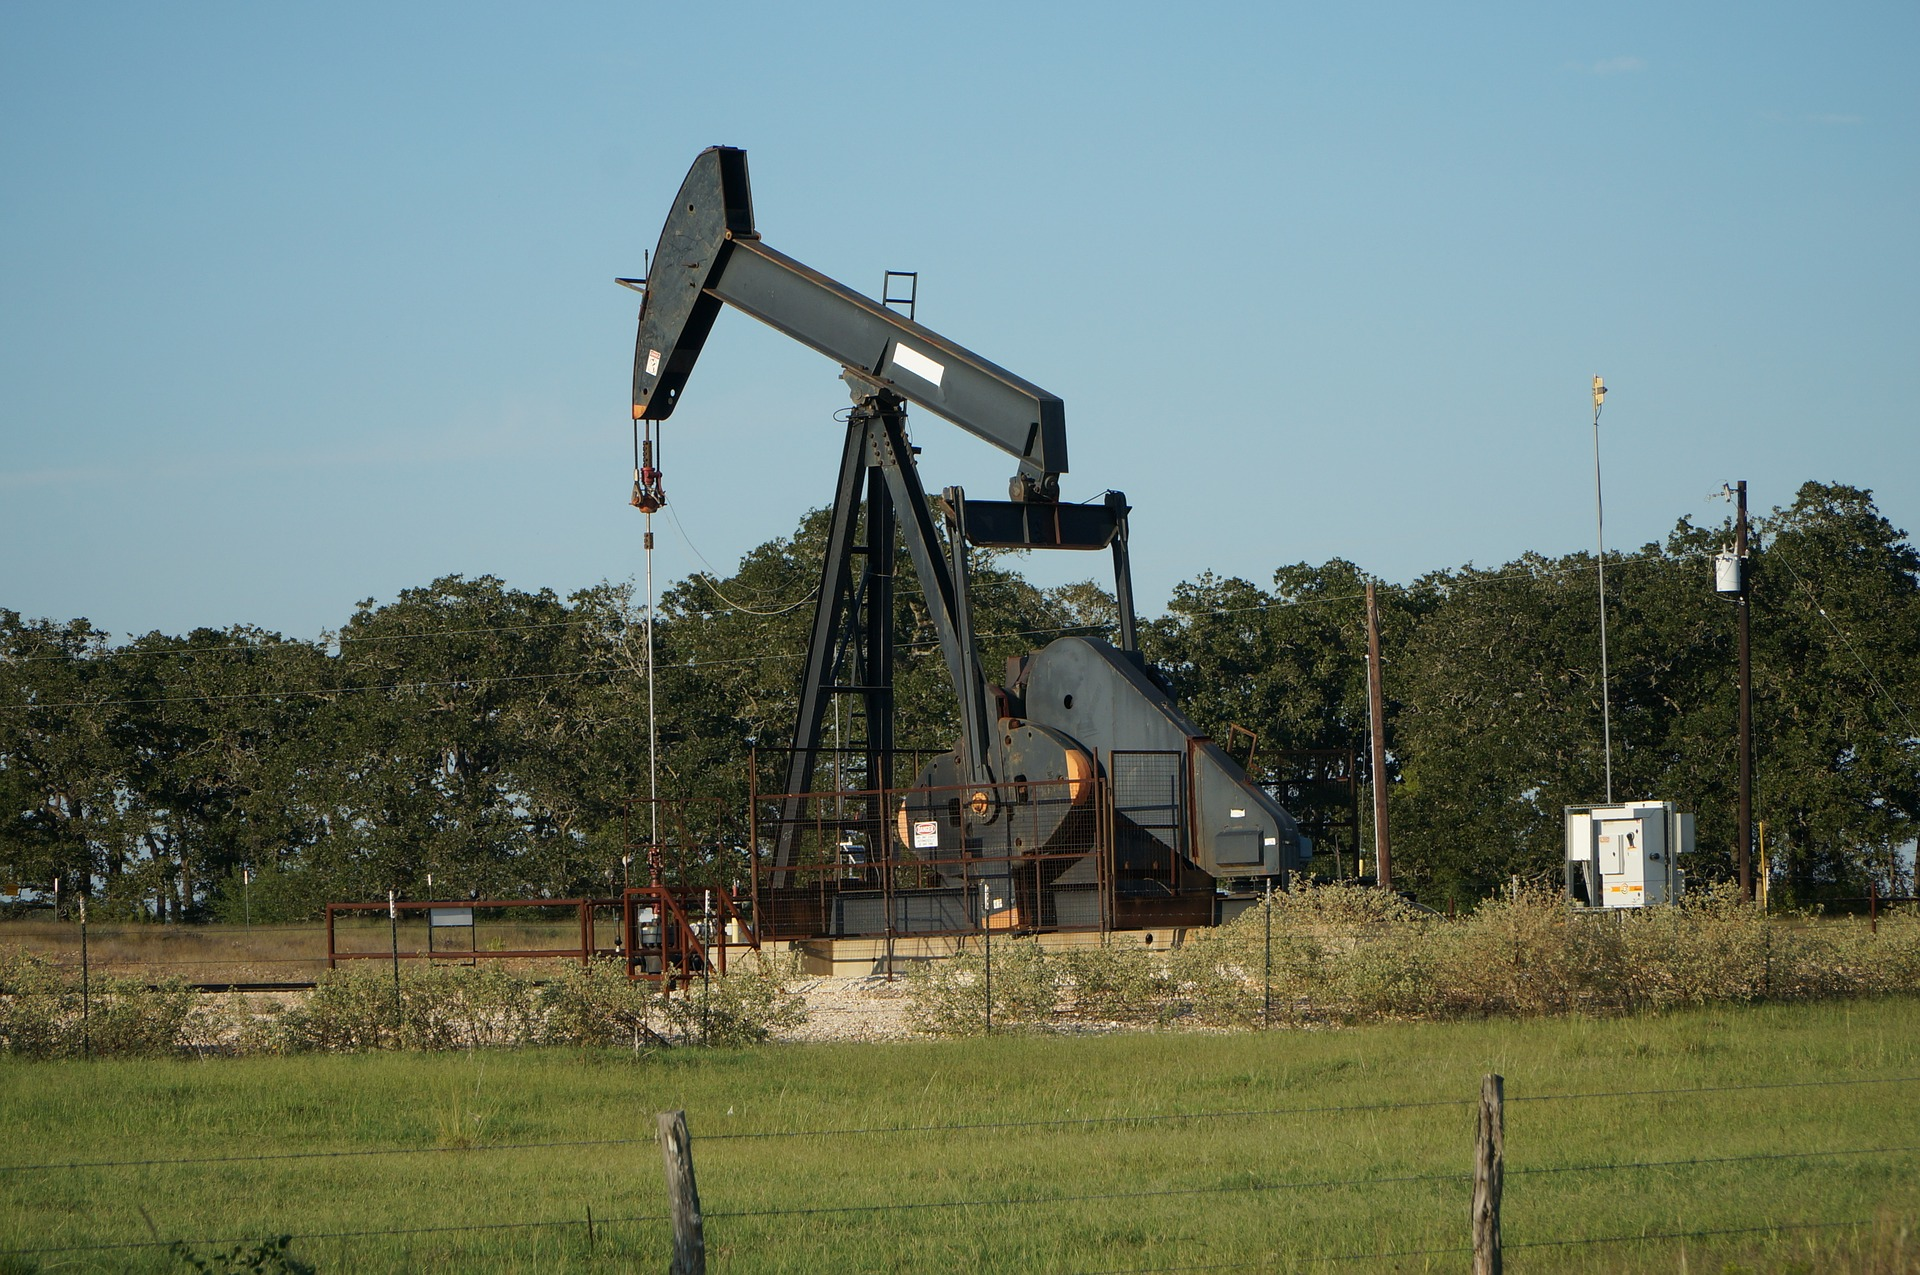 Eagleford Shale pump jack